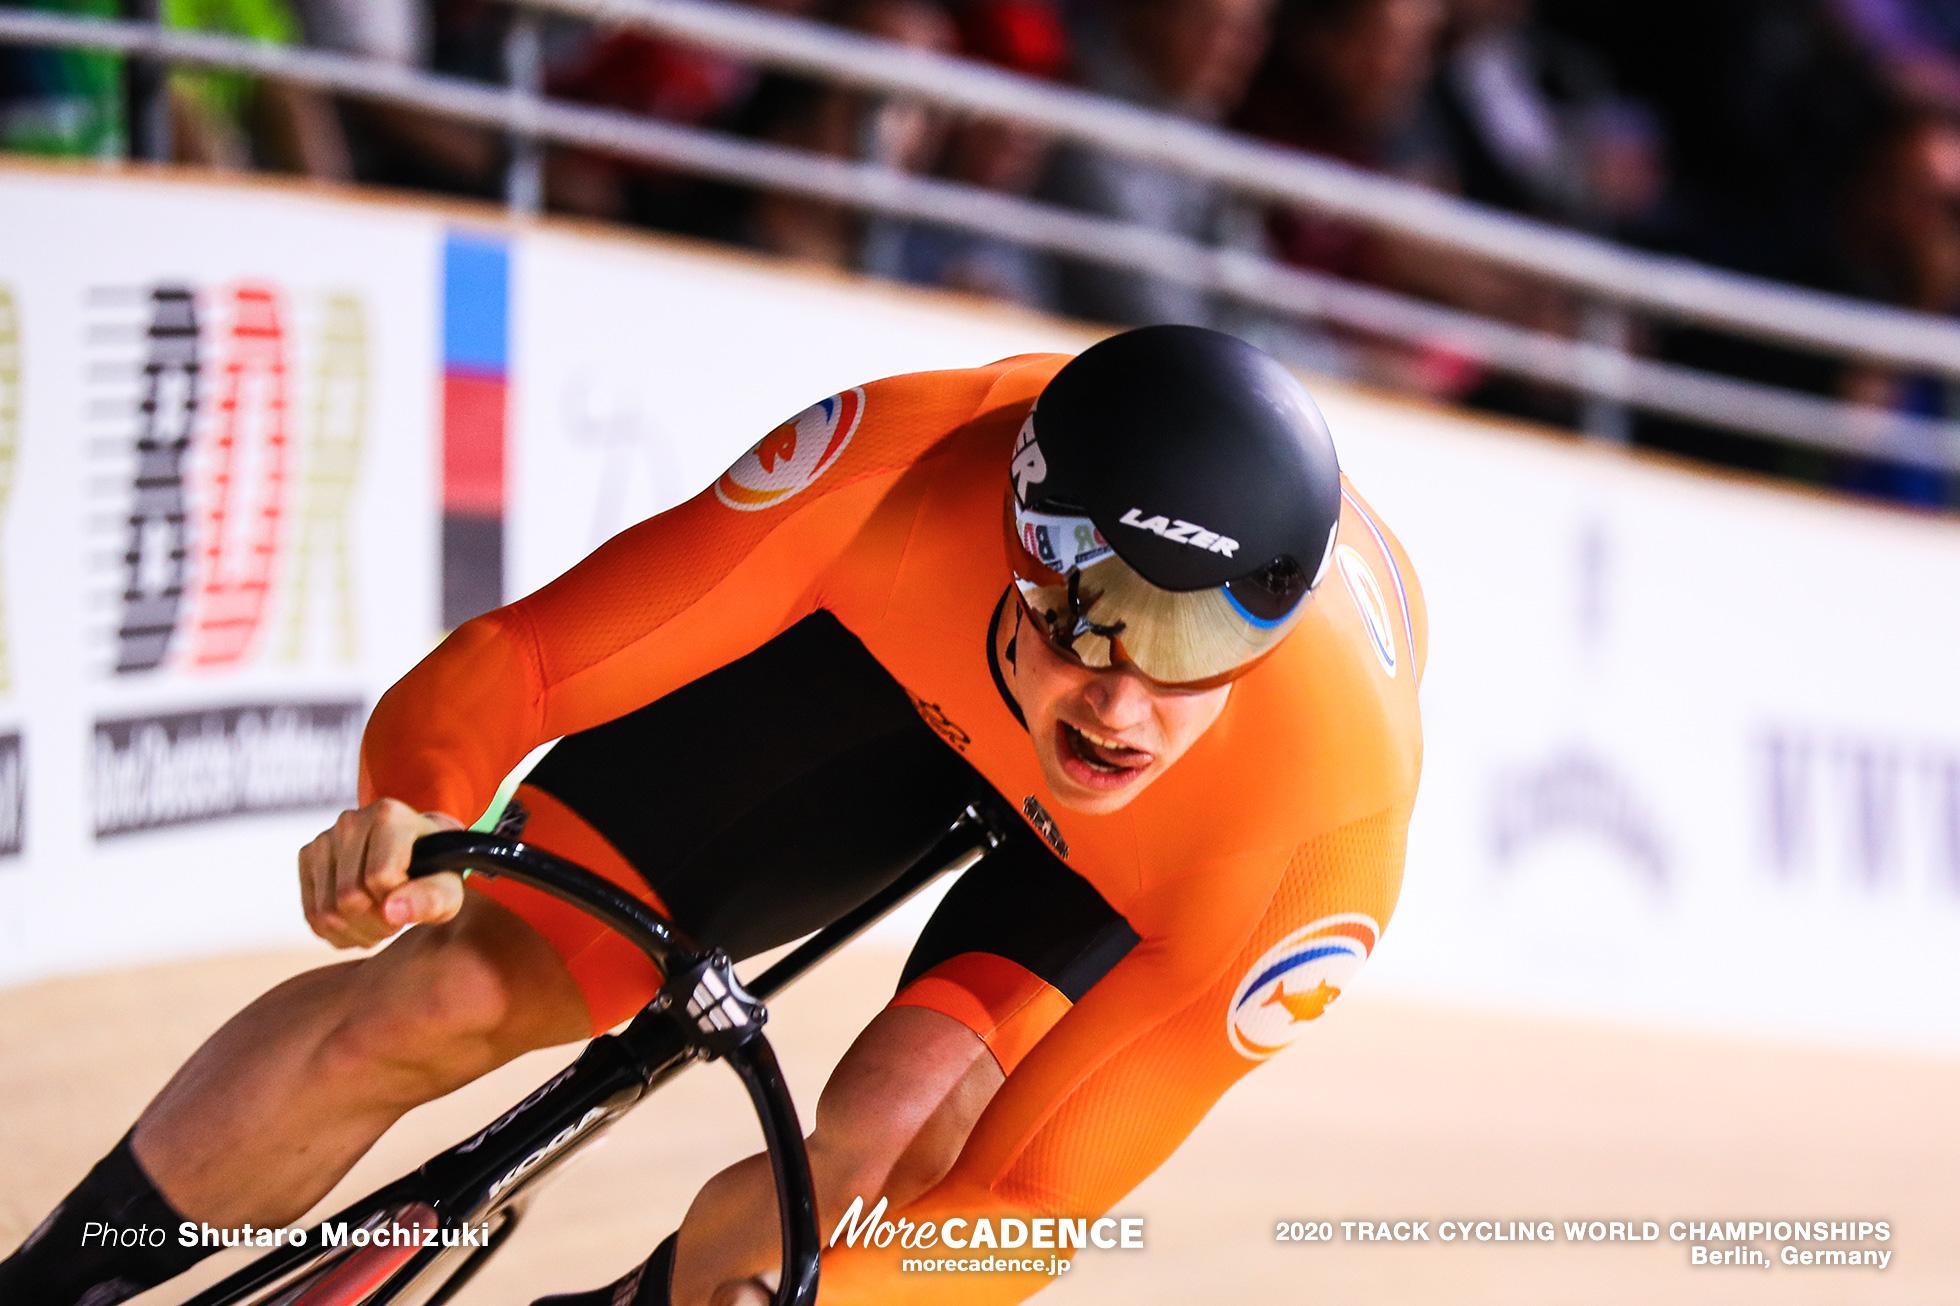 Qualifying / Men's Sprint / 2020 Track Cycling World Championships